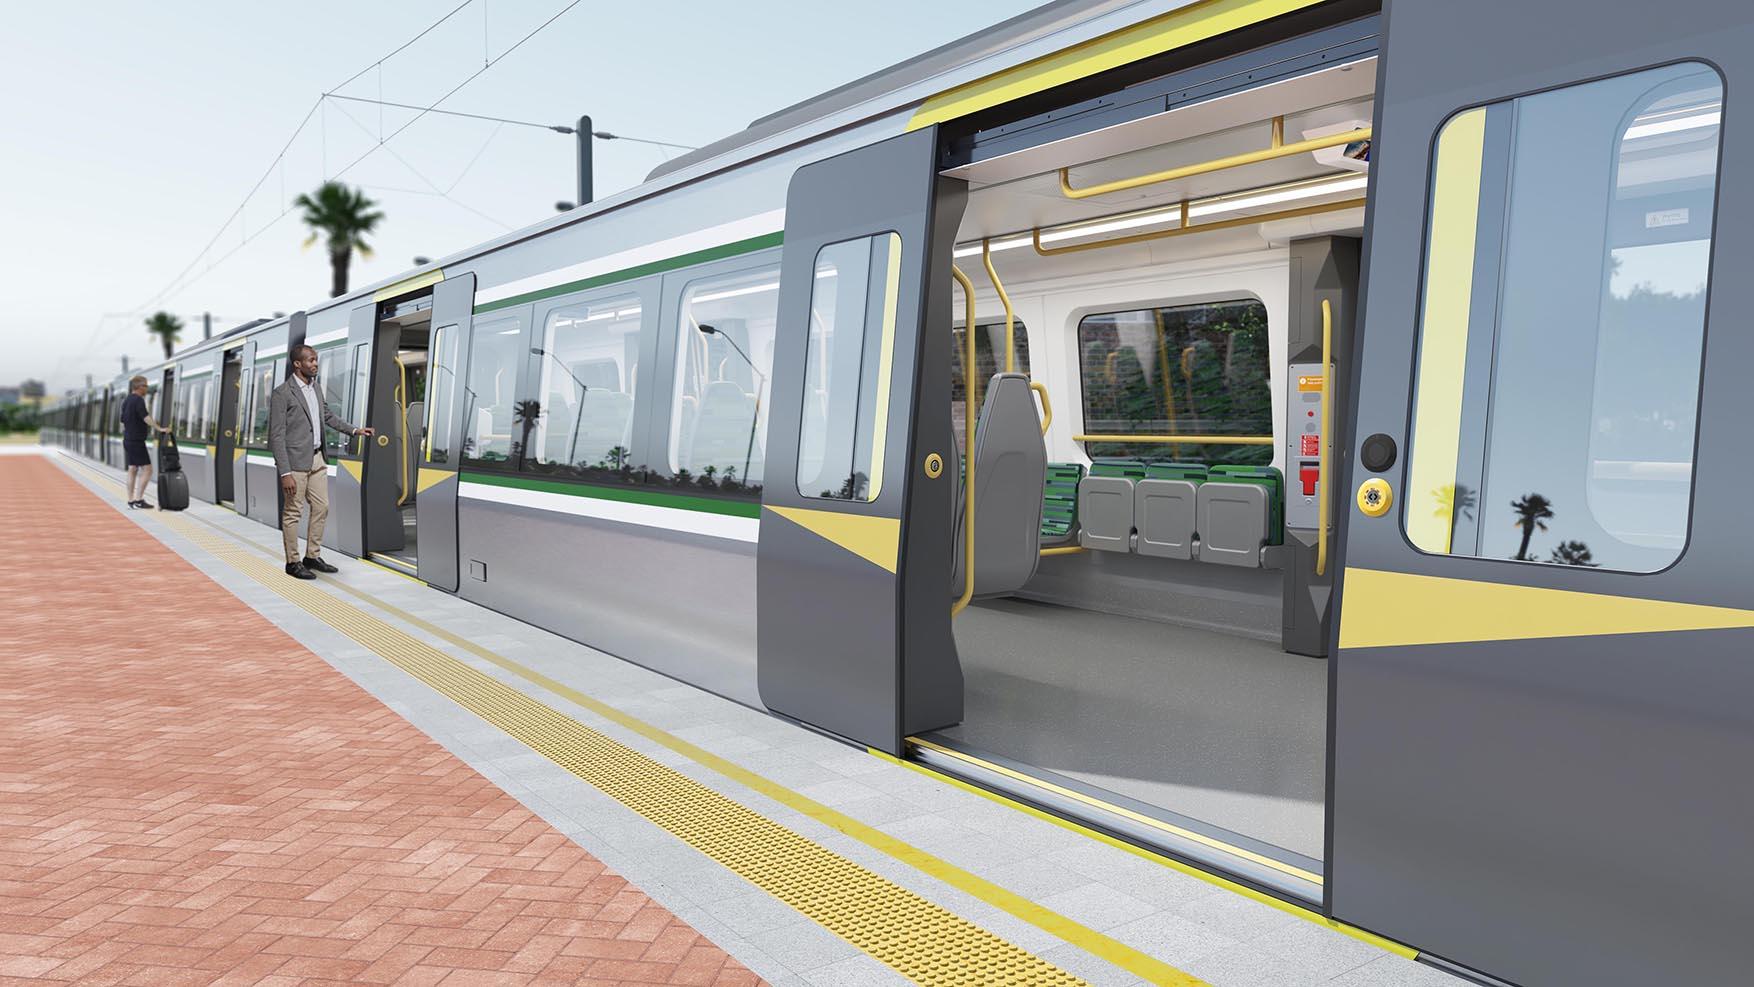 Alstom to provide EMUs and DMUs to Western Australia